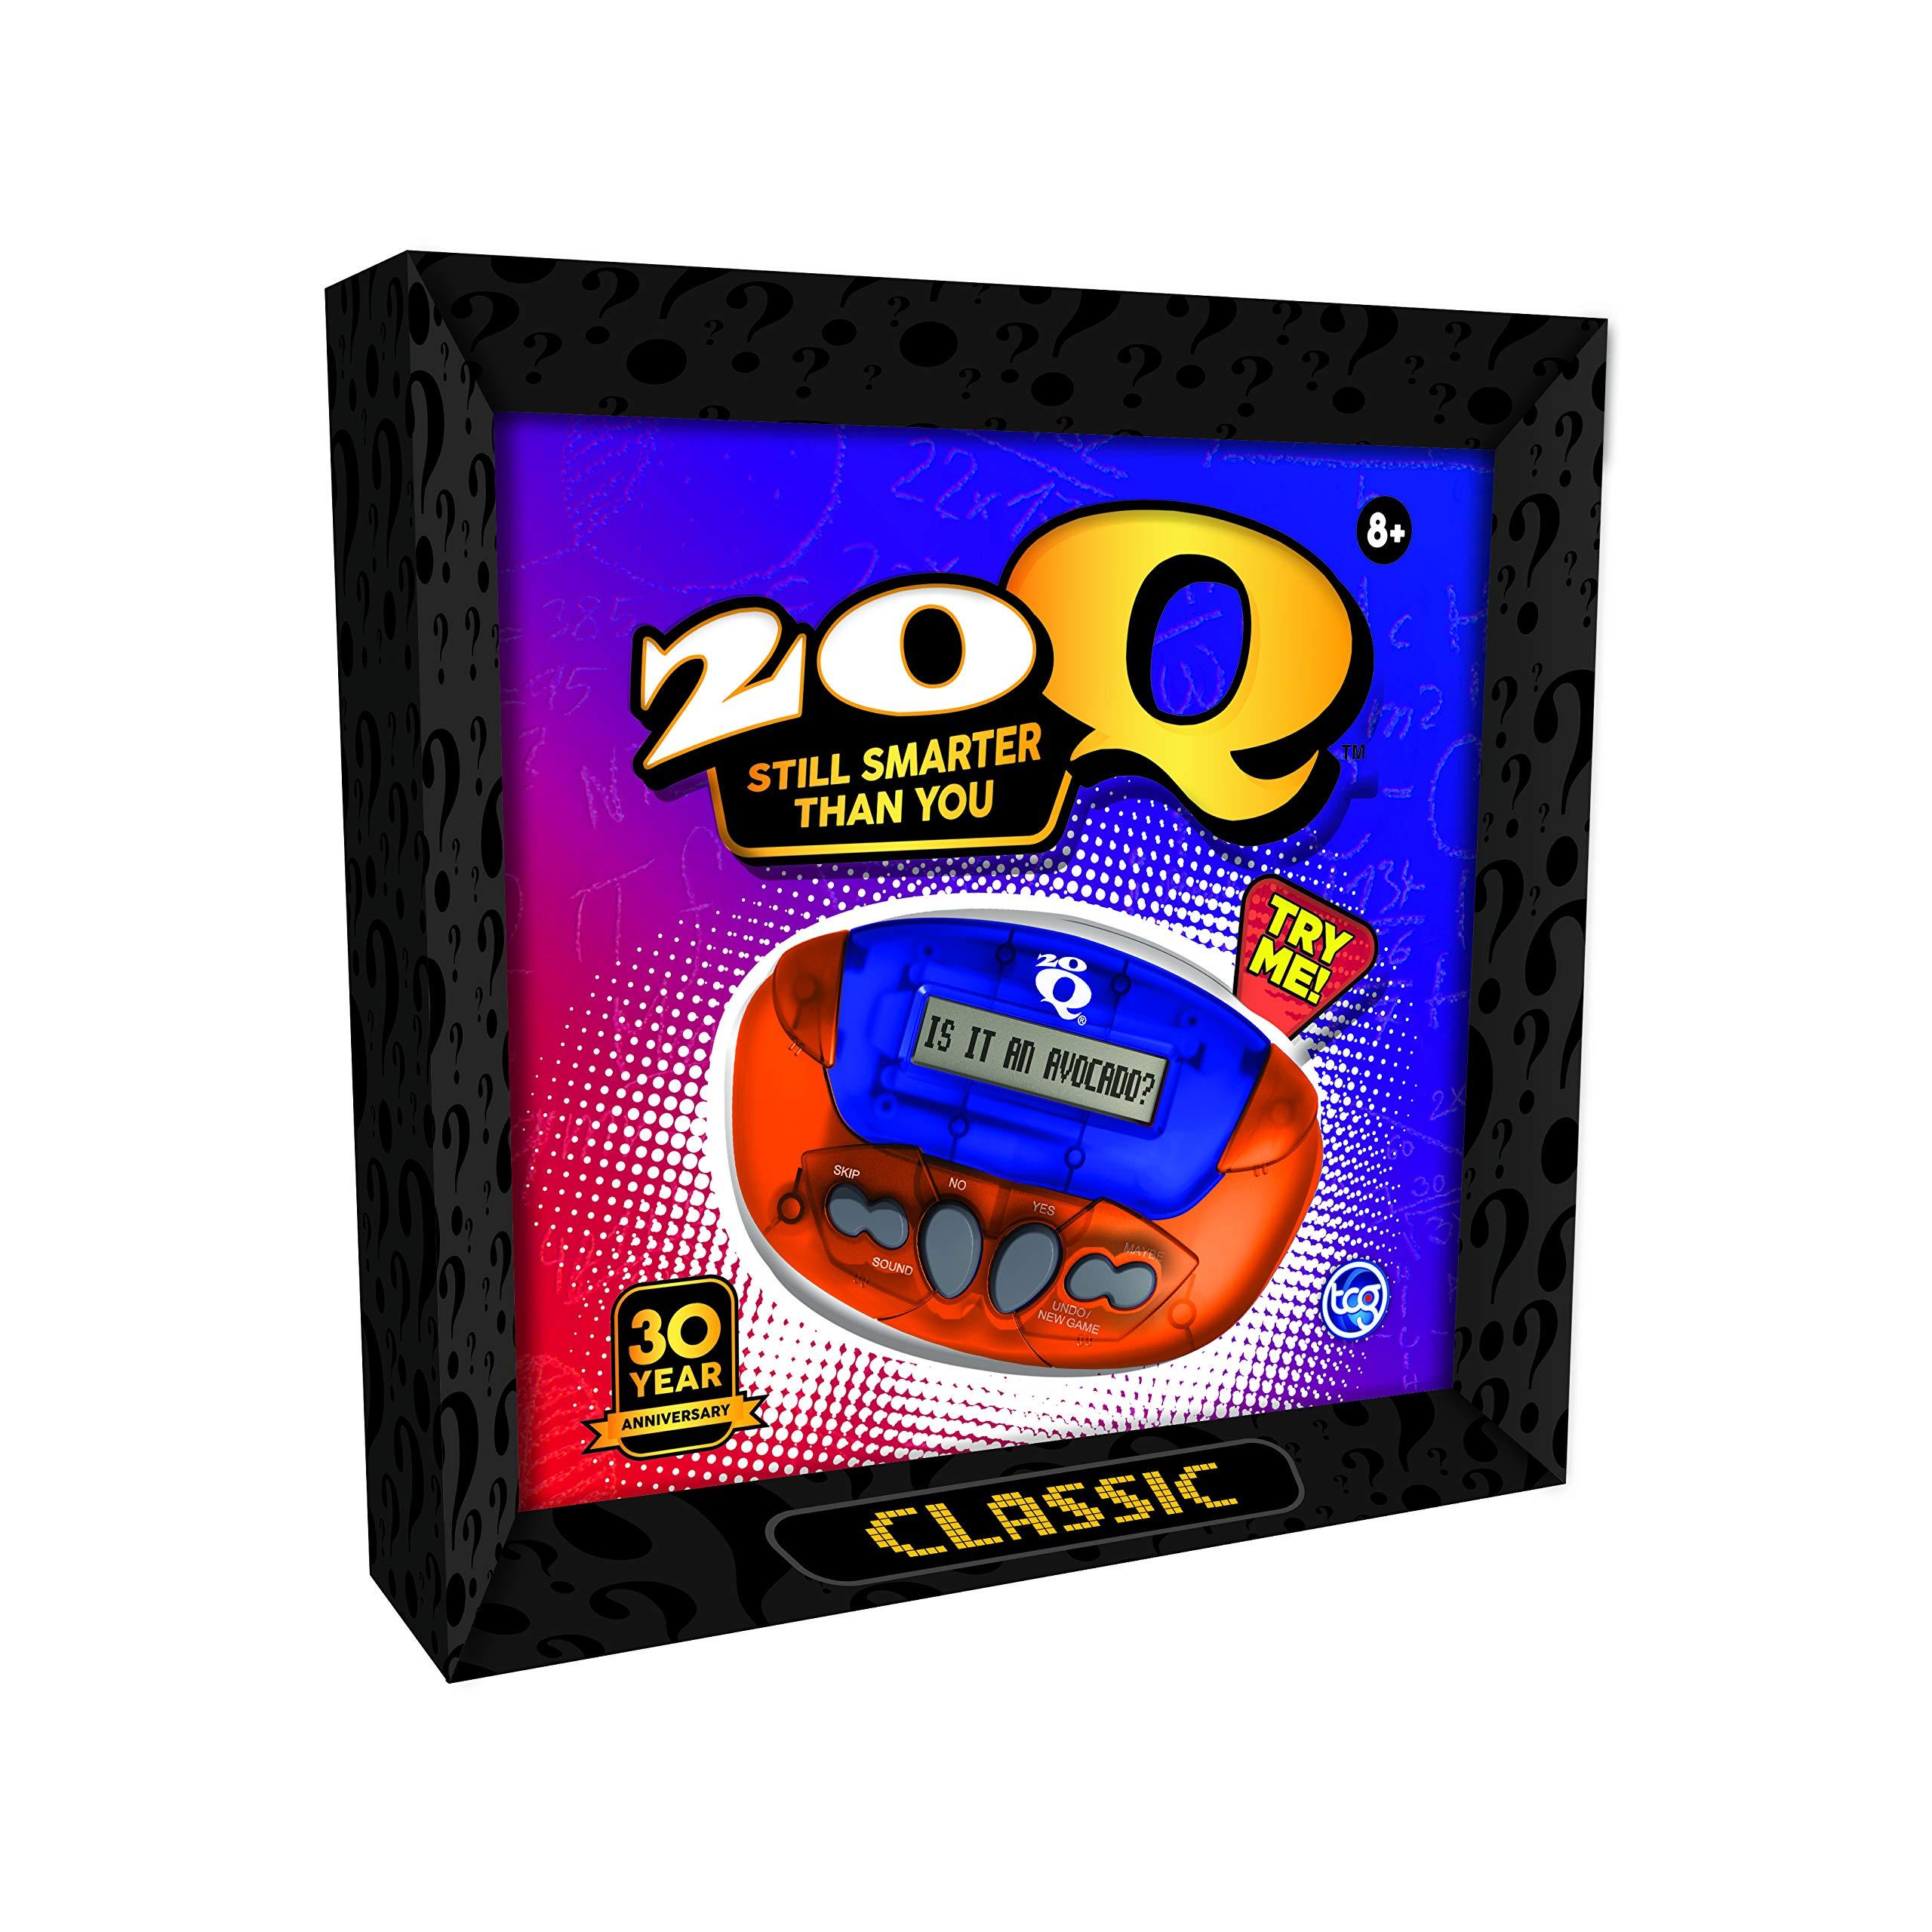 TCG Toys 20Q Classic Blue/Orange by TCG Toys